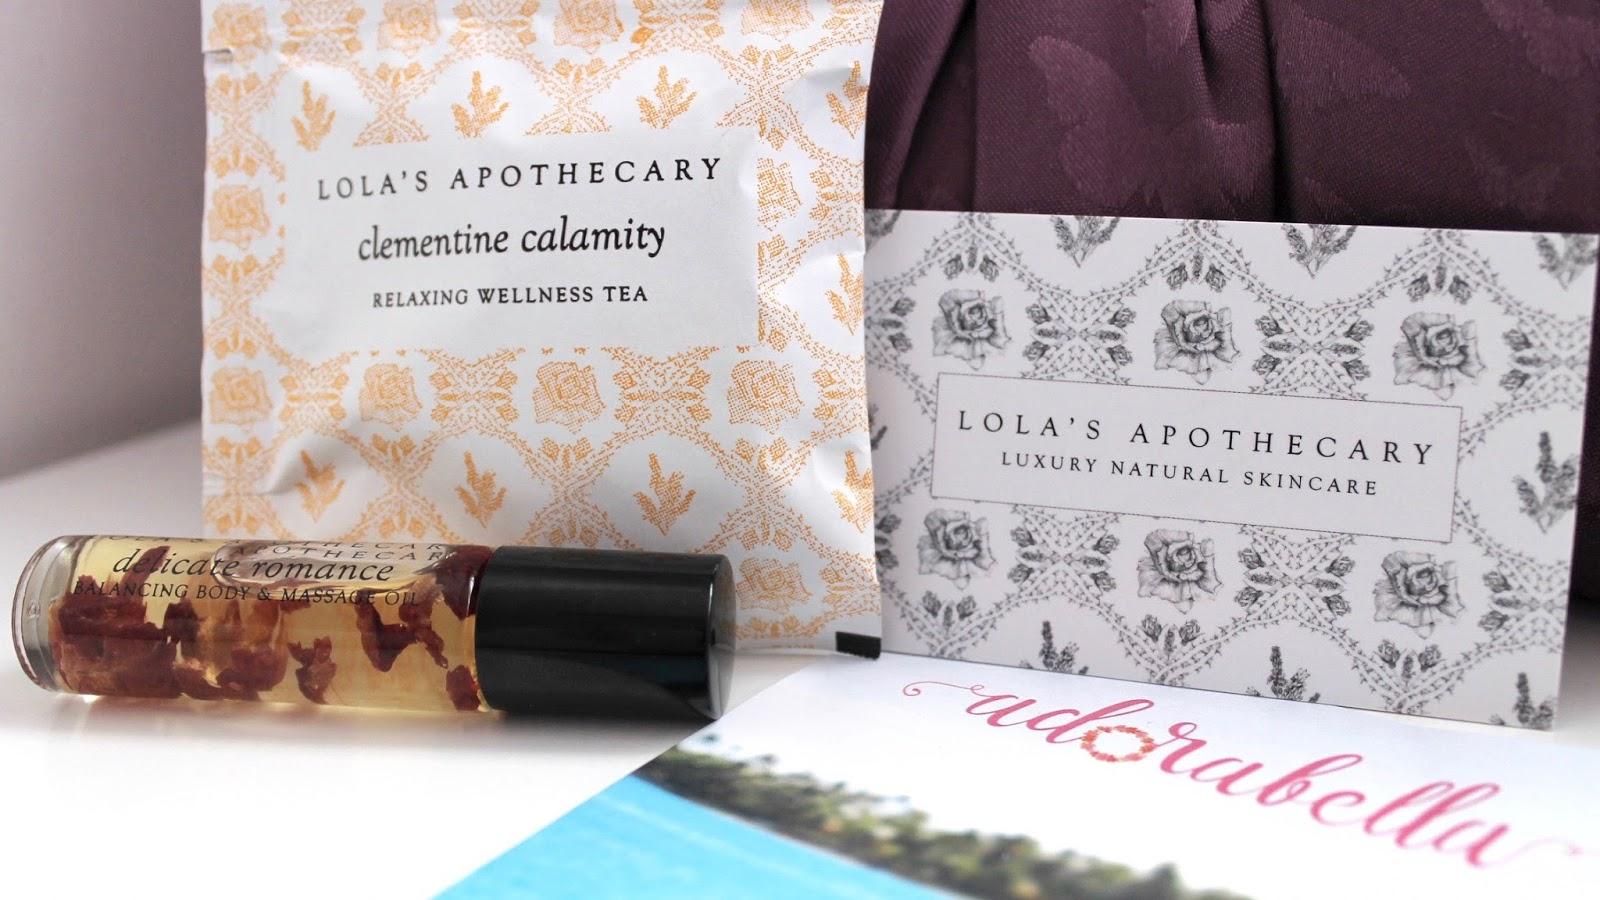 Lola's Apothecary Tea & Rose Scent